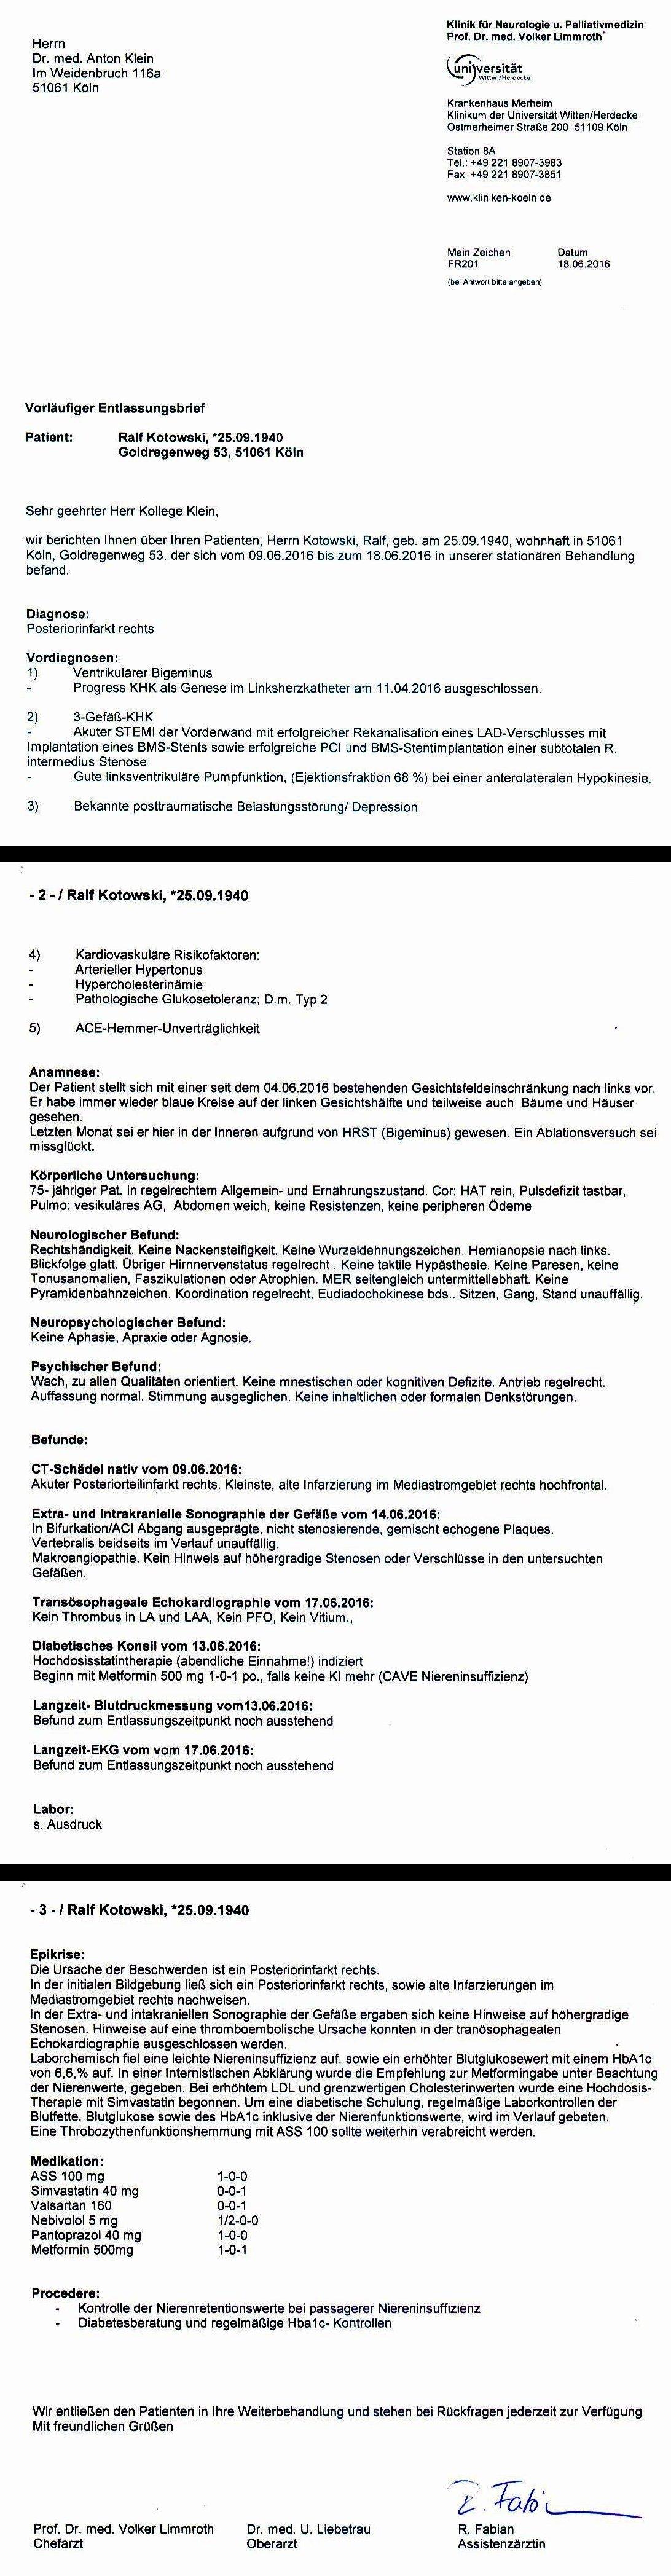 Charmant Echokardiogramm Berichtsvorlage Galerie - Entry Level ...